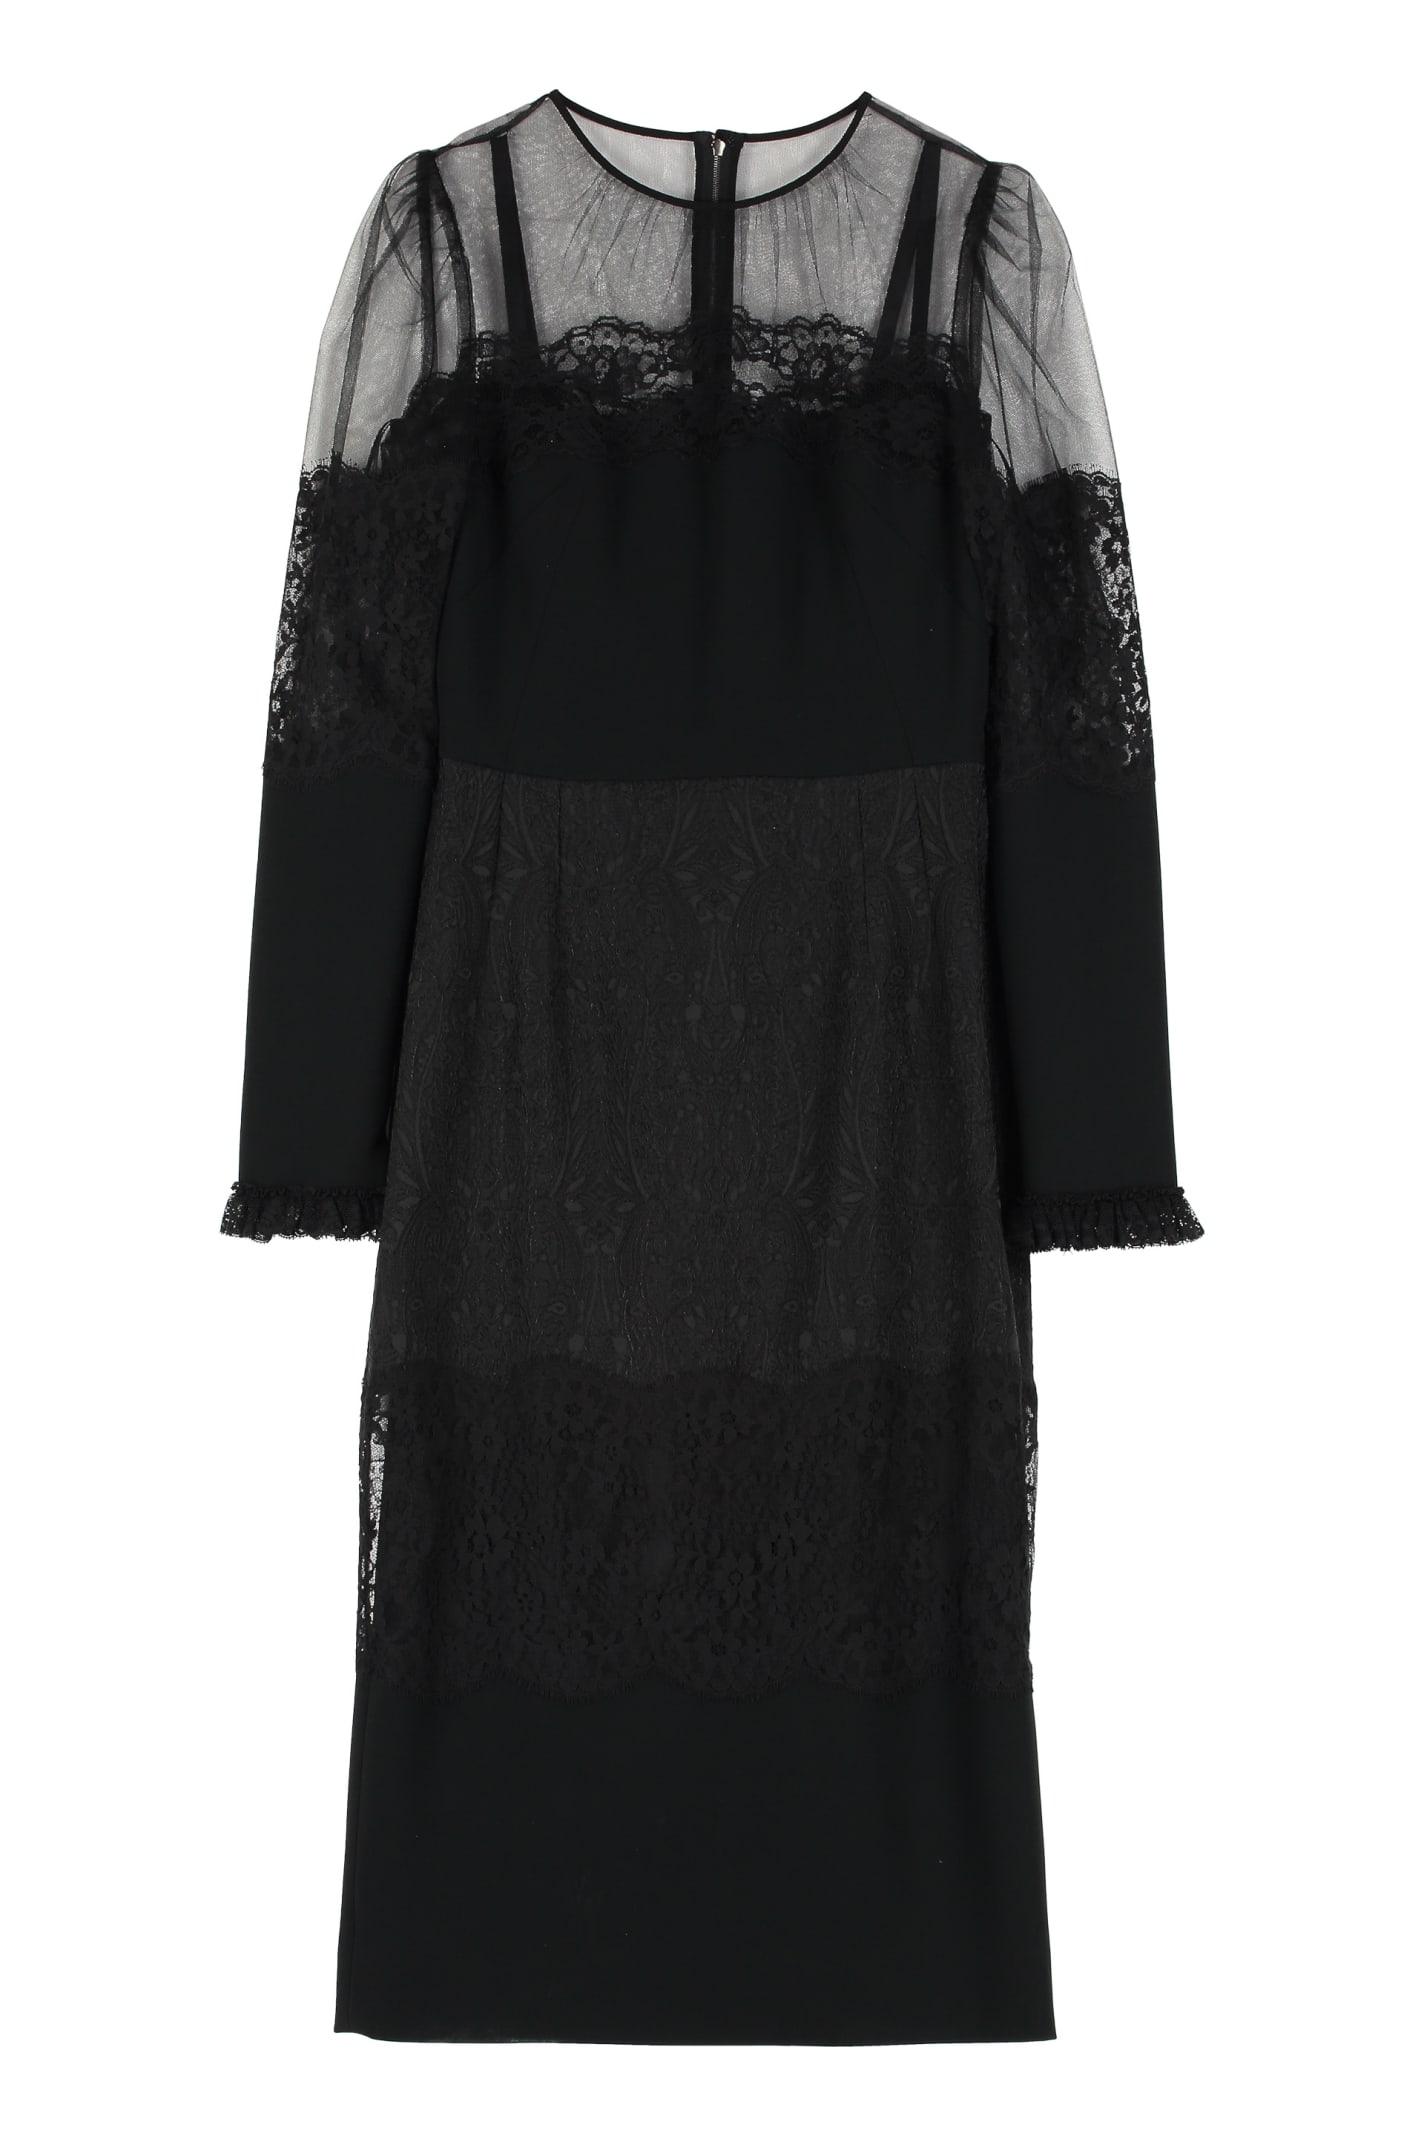 Buy Dolce & Gabbana Cady Midi Sheat-dress online, shop Dolce & Gabbana with free shipping